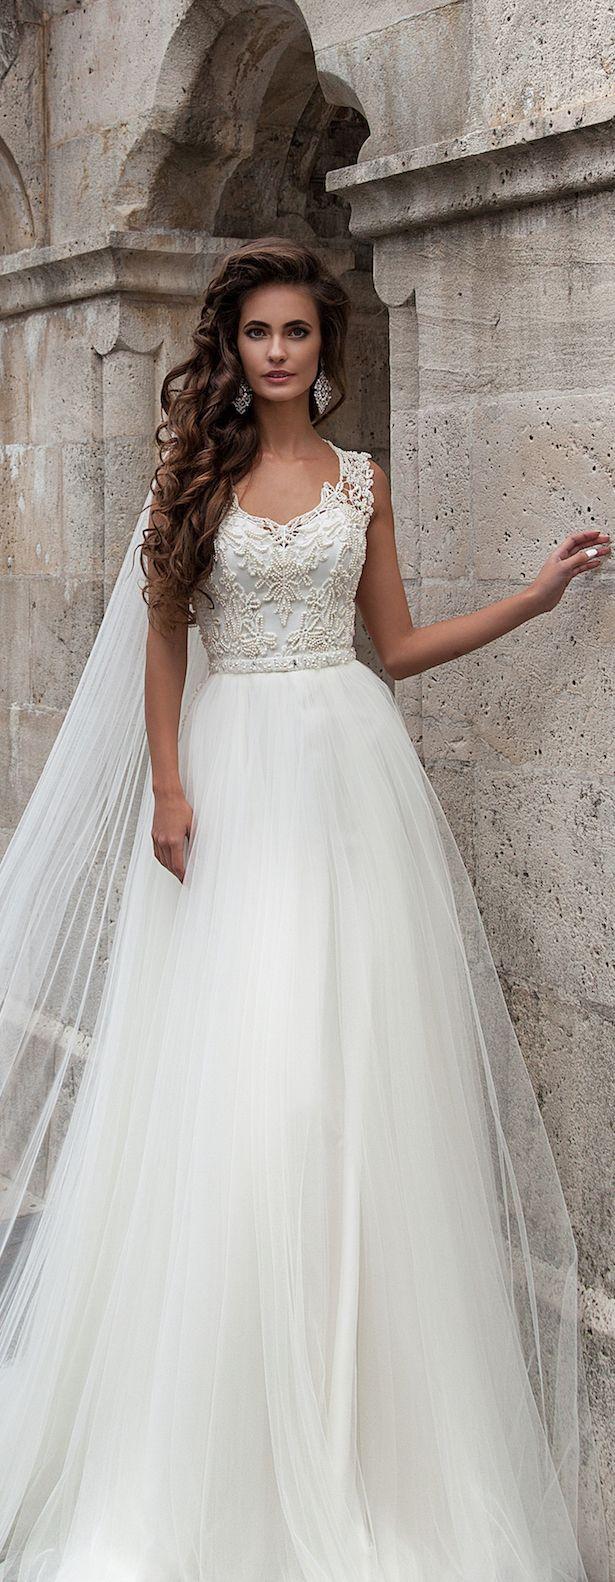 best Wedding images on Pinterest  Wedding ideas Groom attire